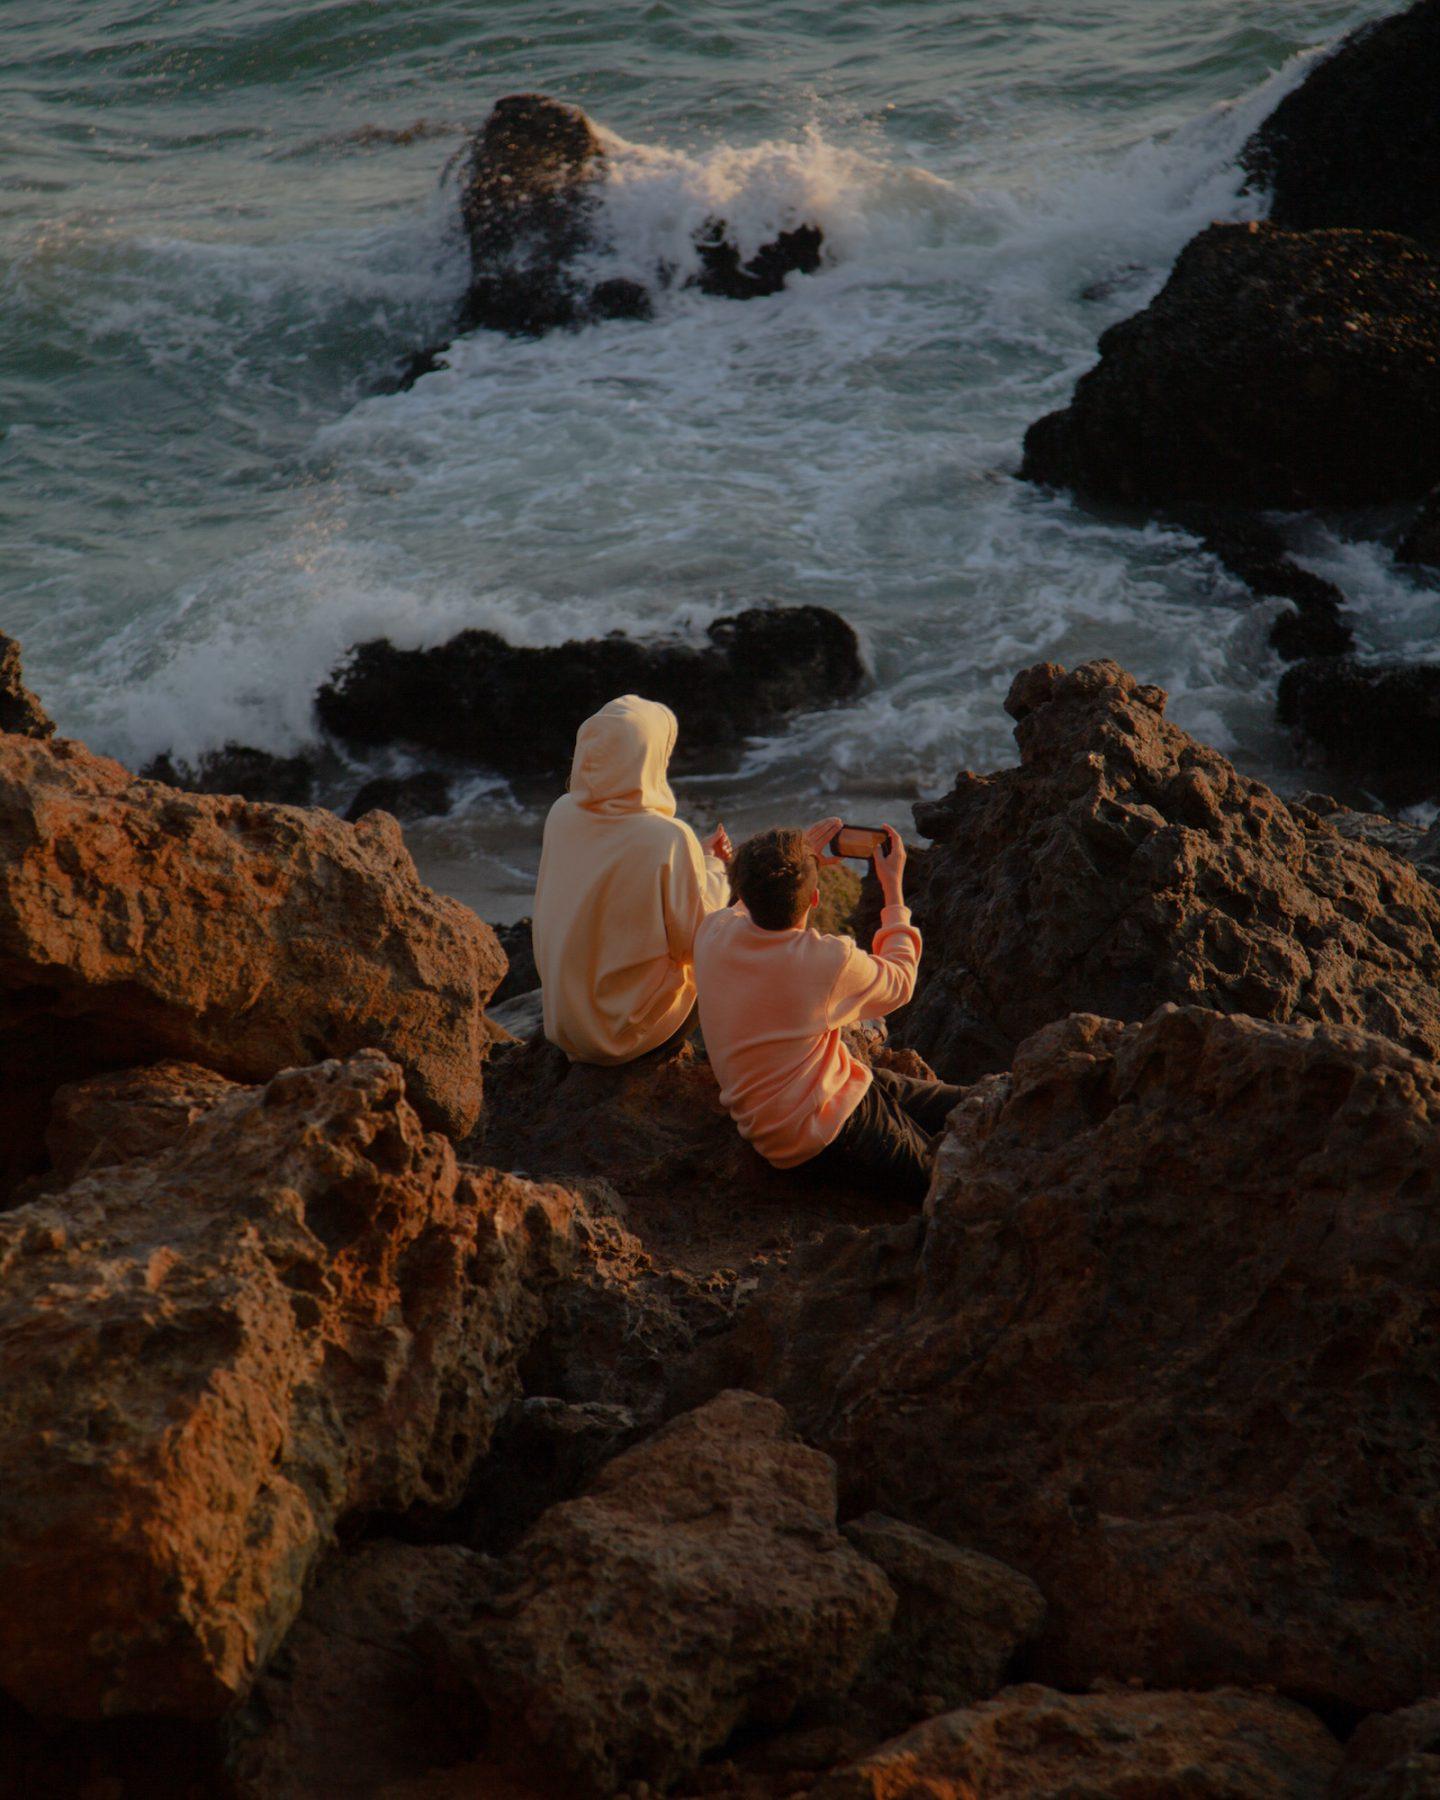 IGNANT-Photography-Jiahow-Peng-01